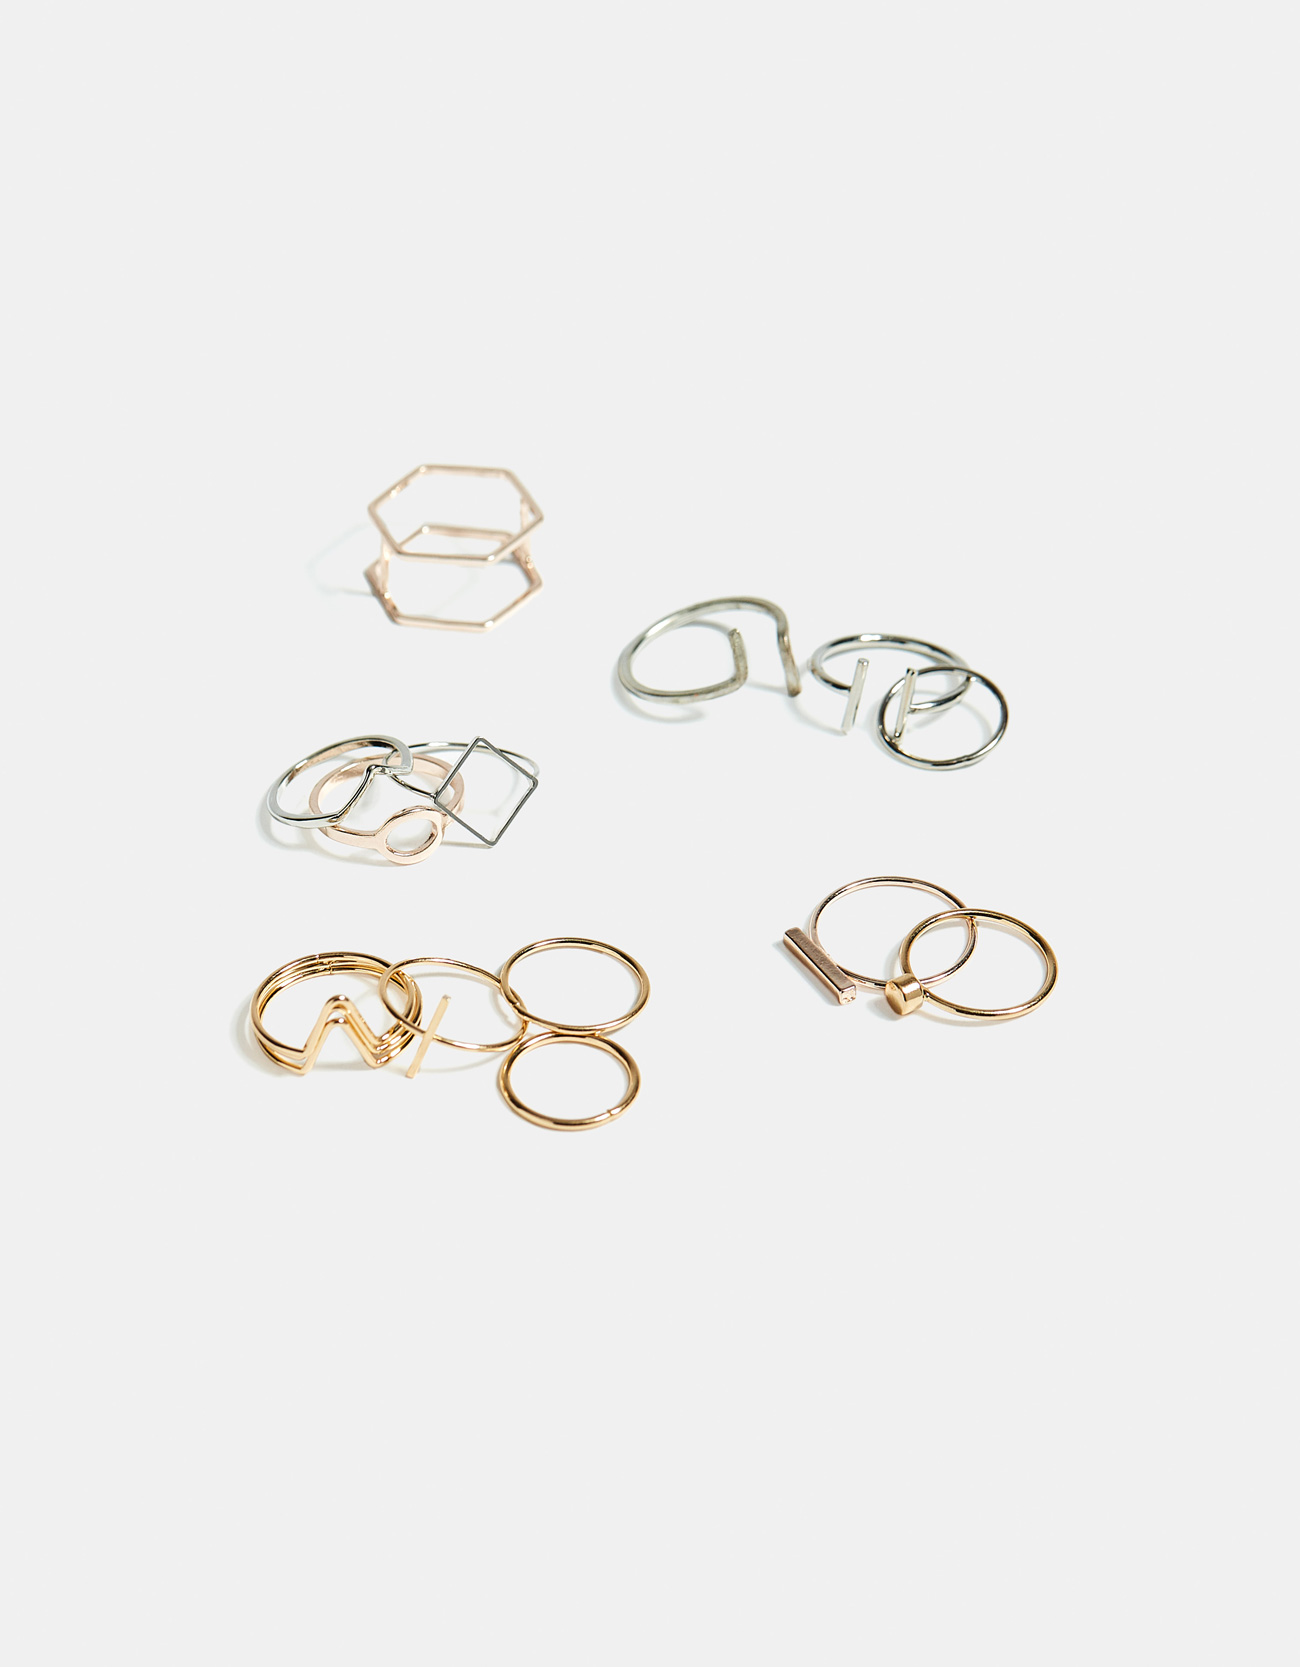 8c2b5be0770a Bershka Set de anillos finos a 7.99€